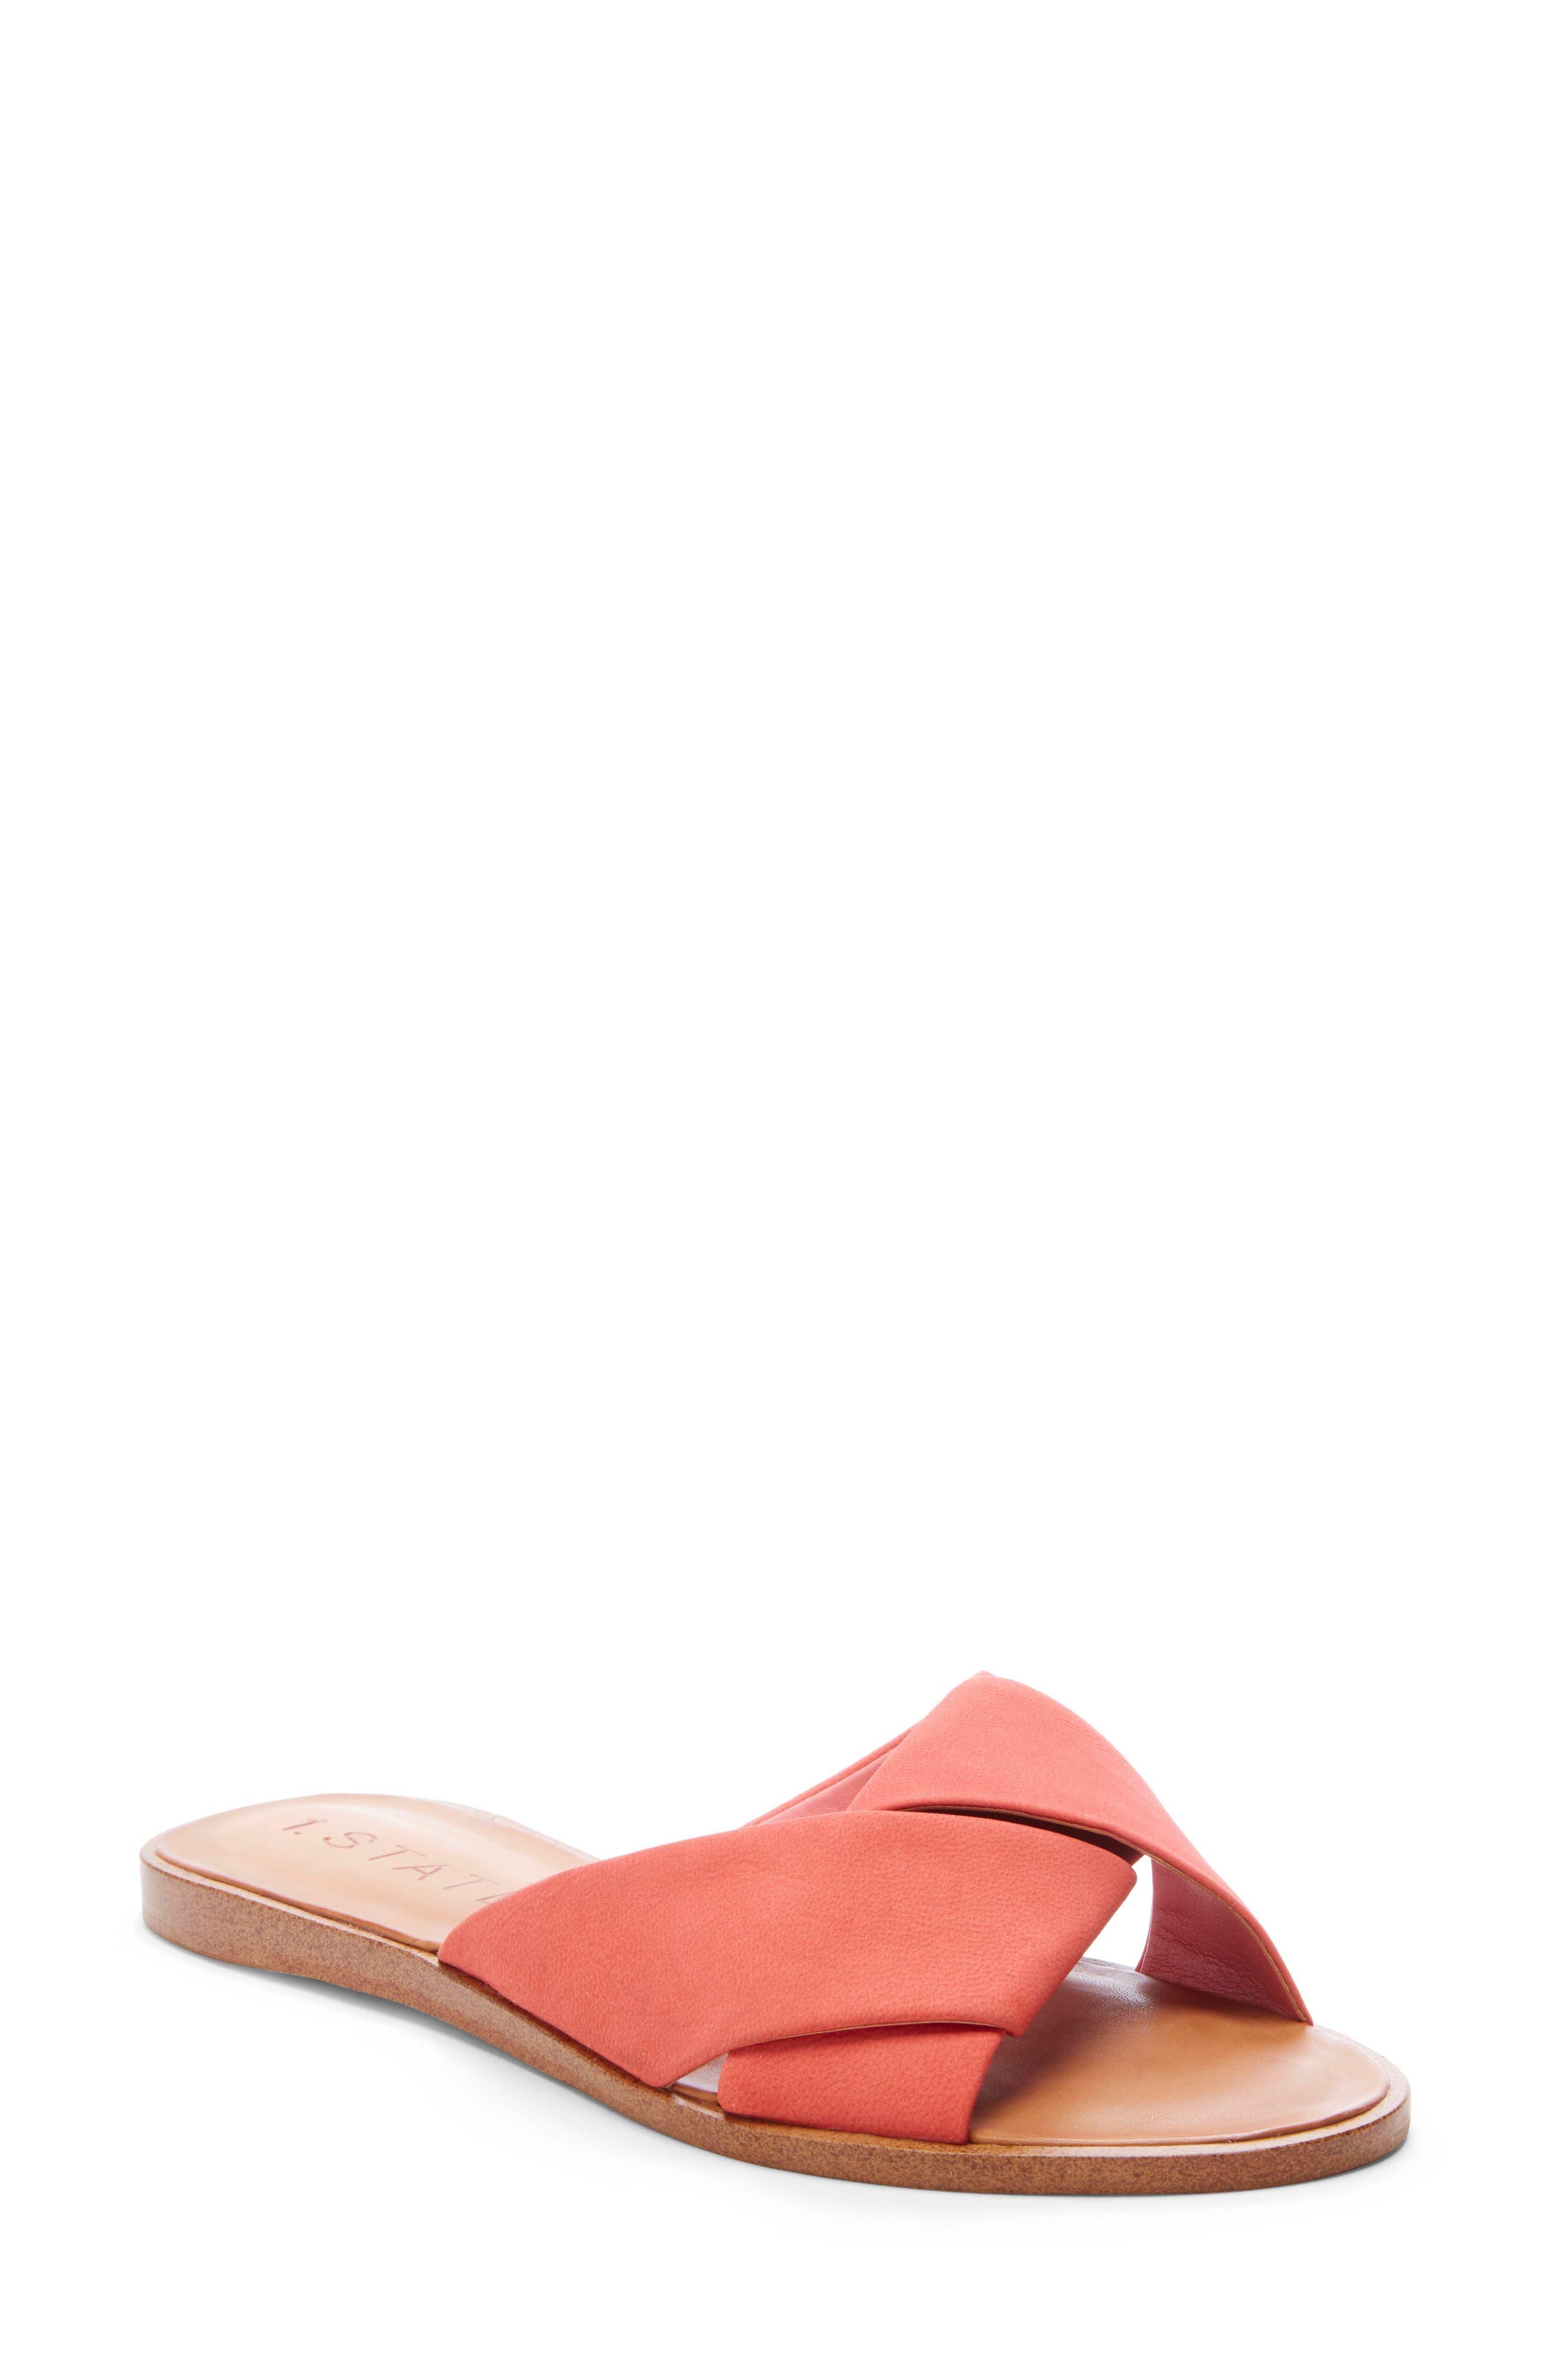 049659f43d7ef Women s Sandals New Arrivals  Clothing